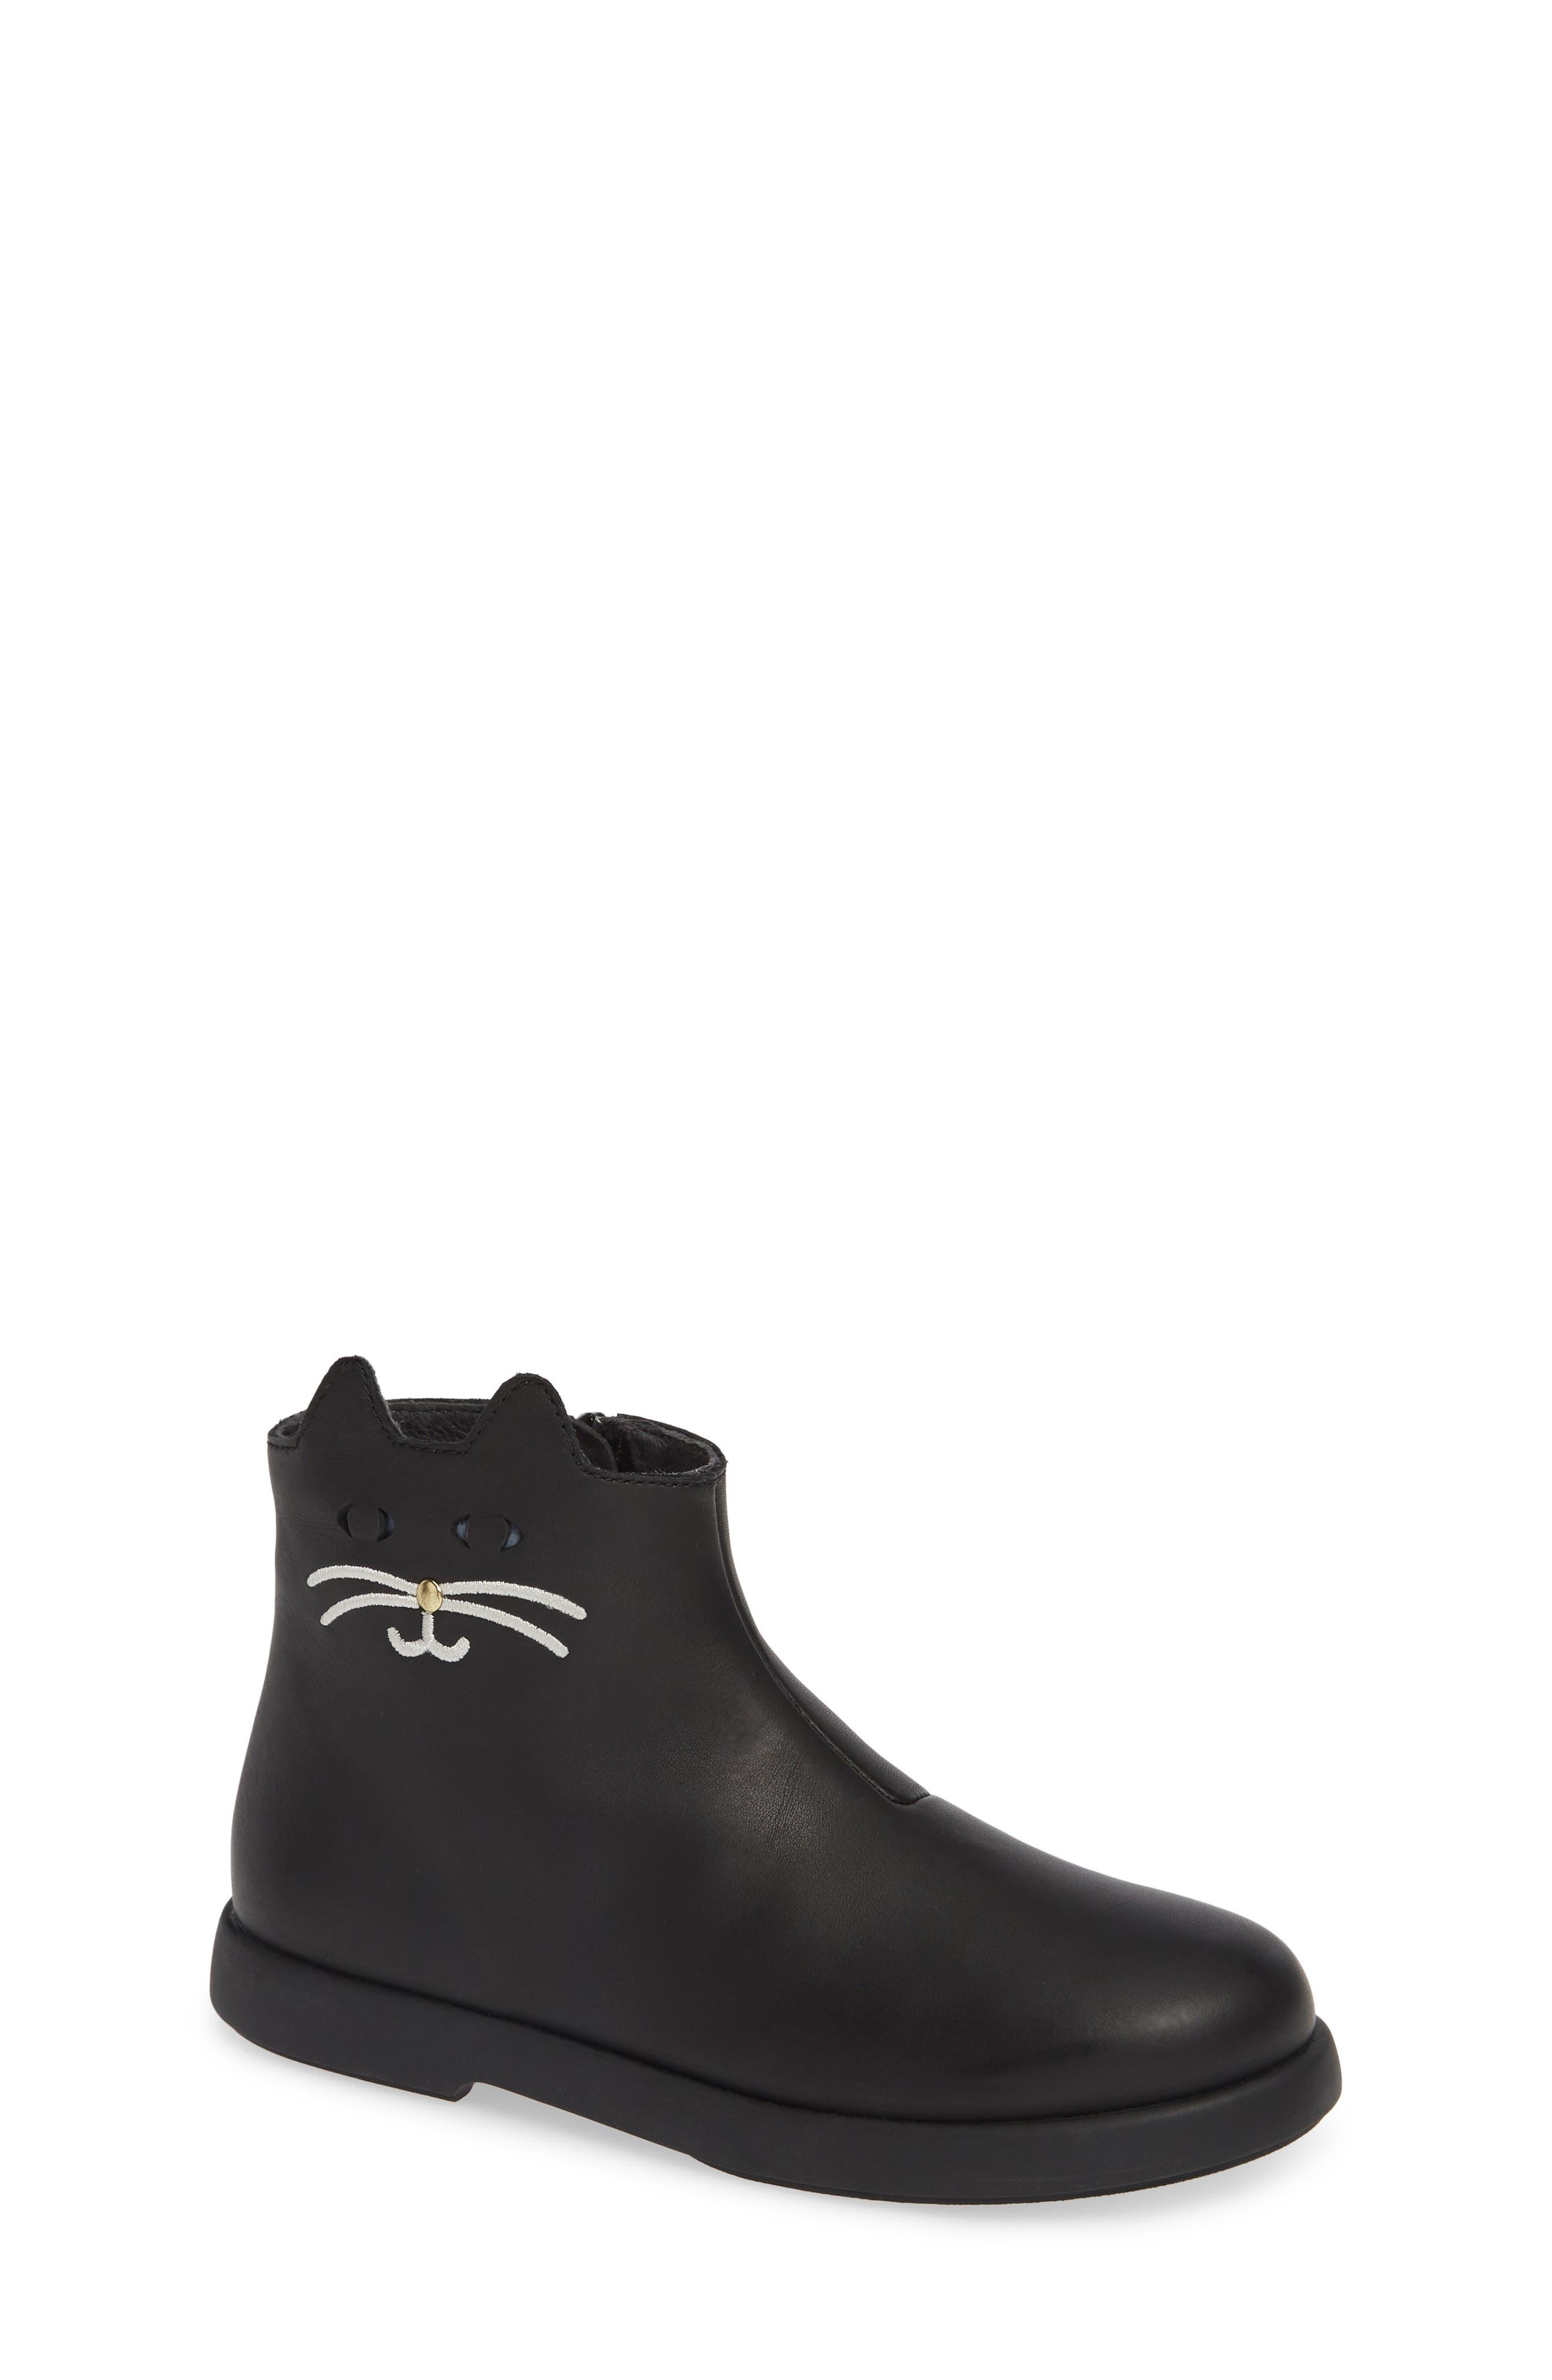 CAMPER Duet Boot, Main, color, BLACK